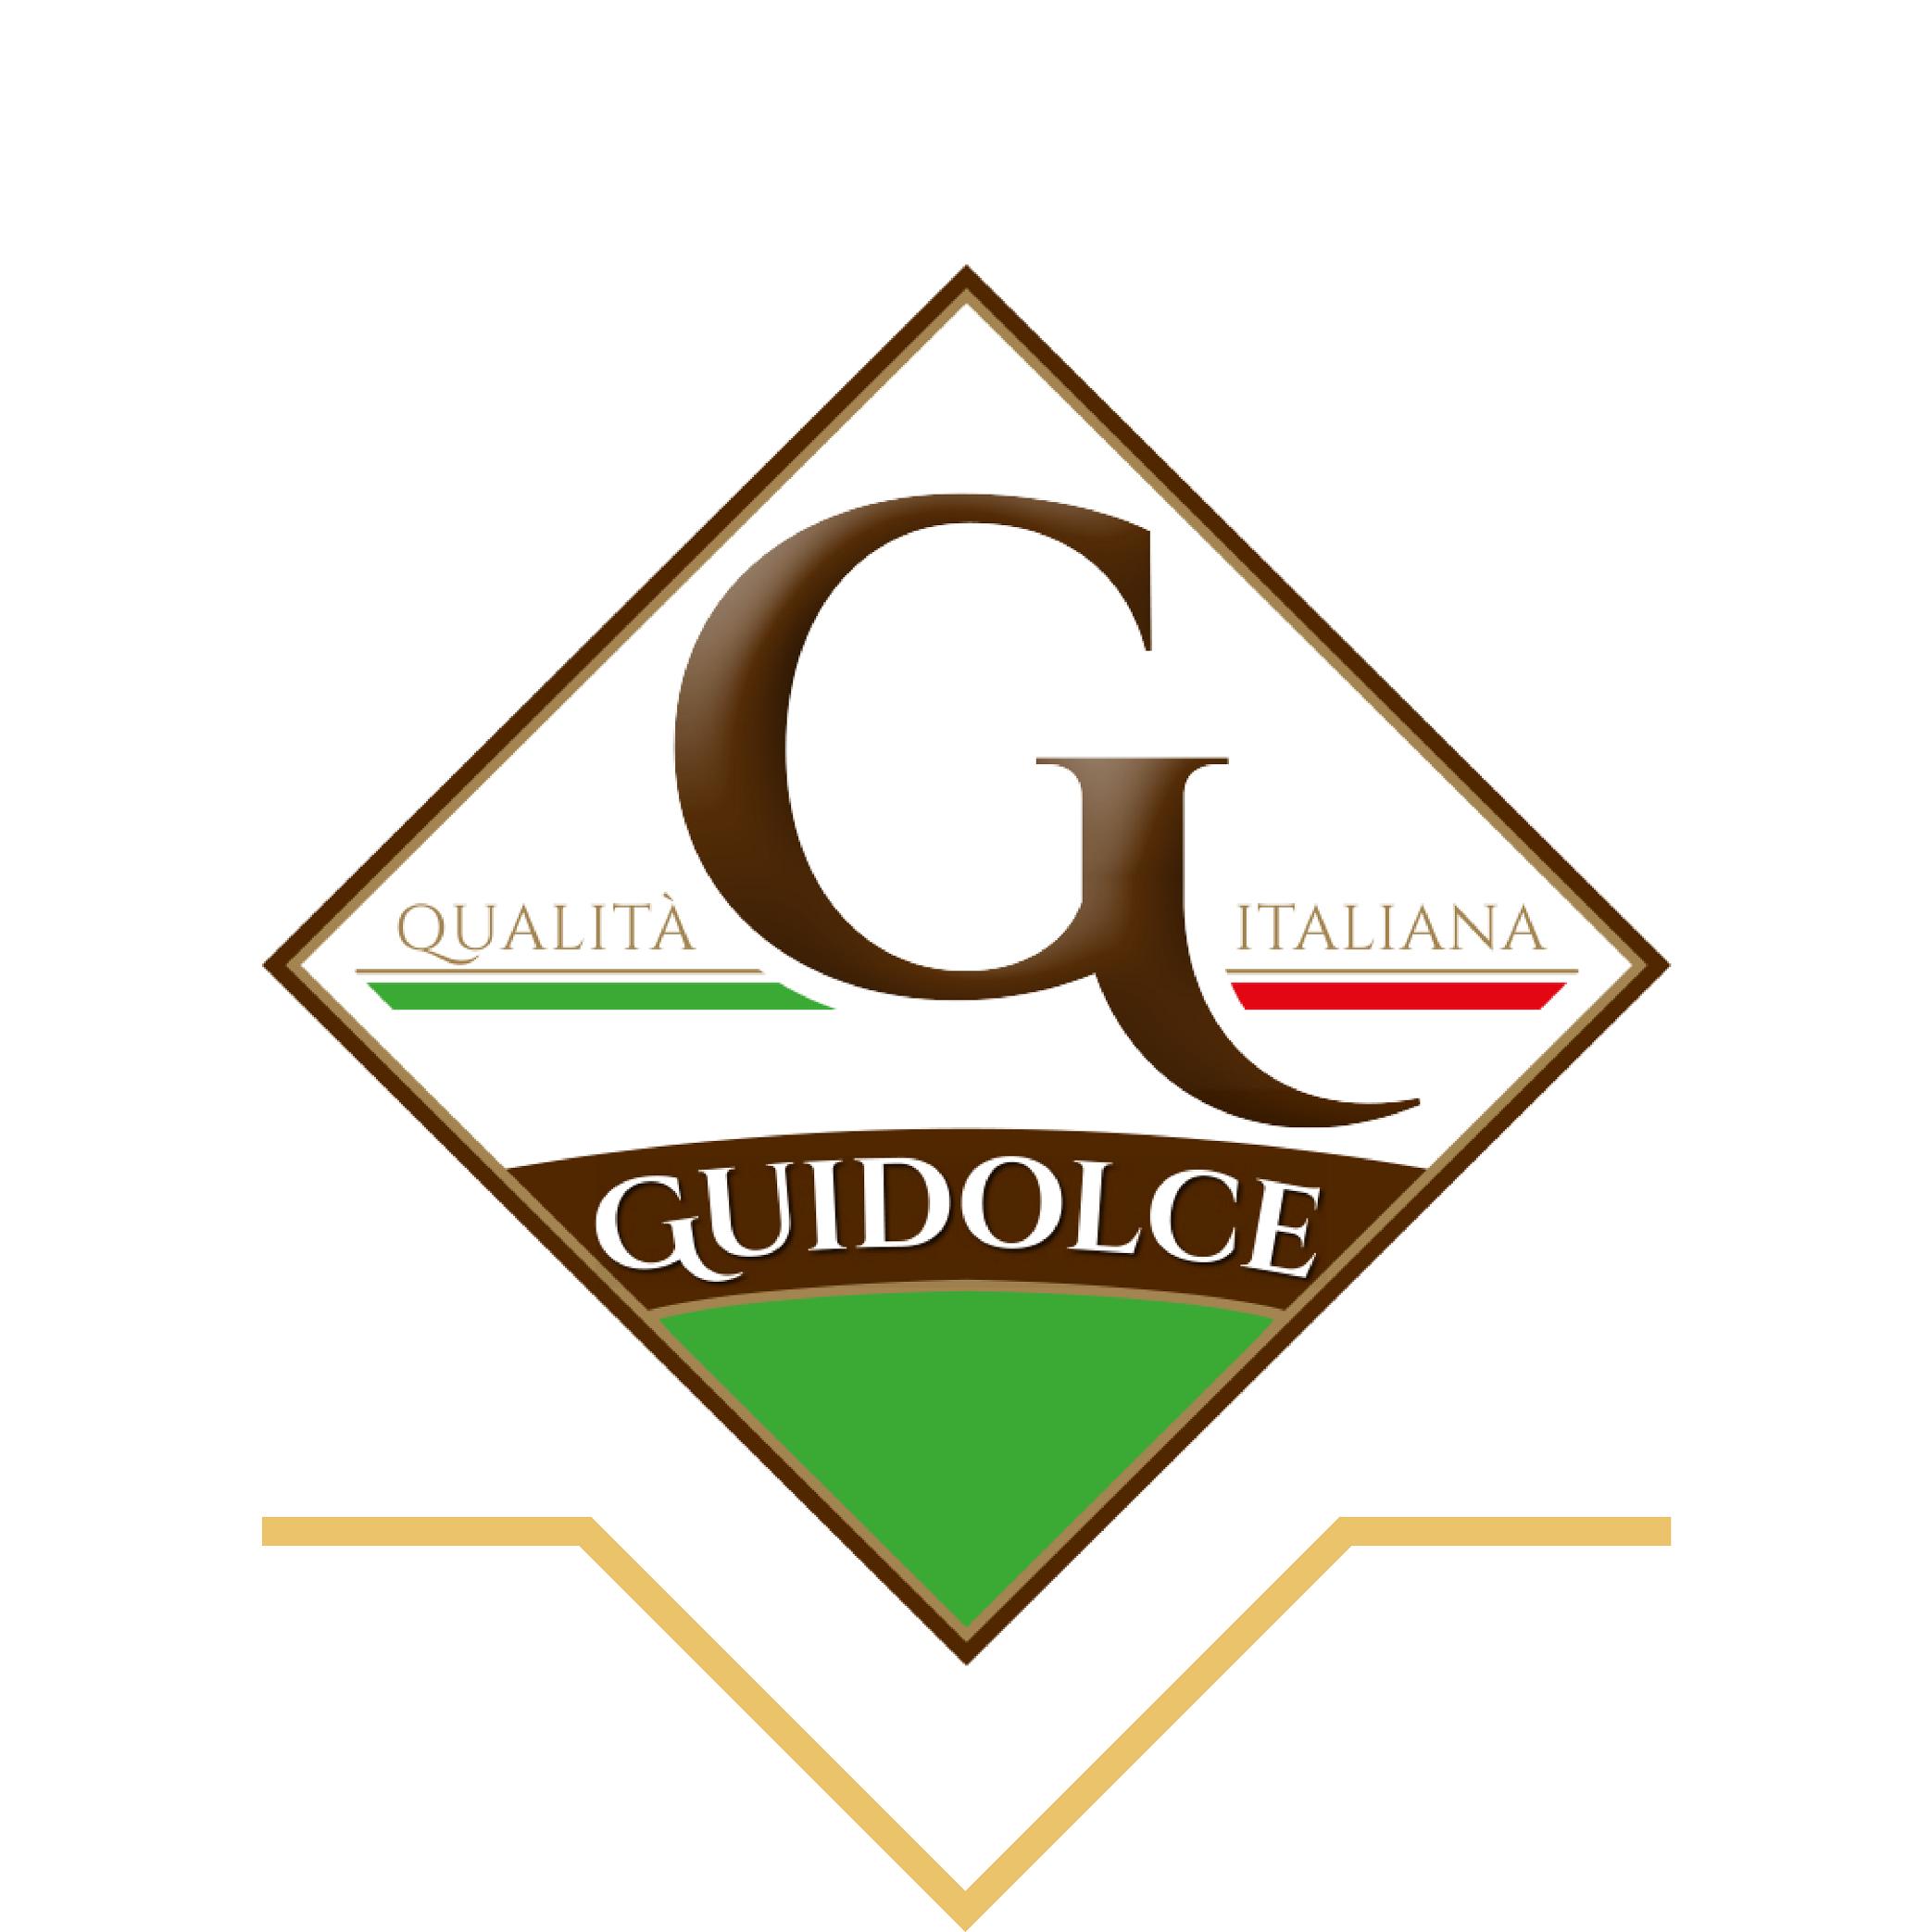 Guidolce